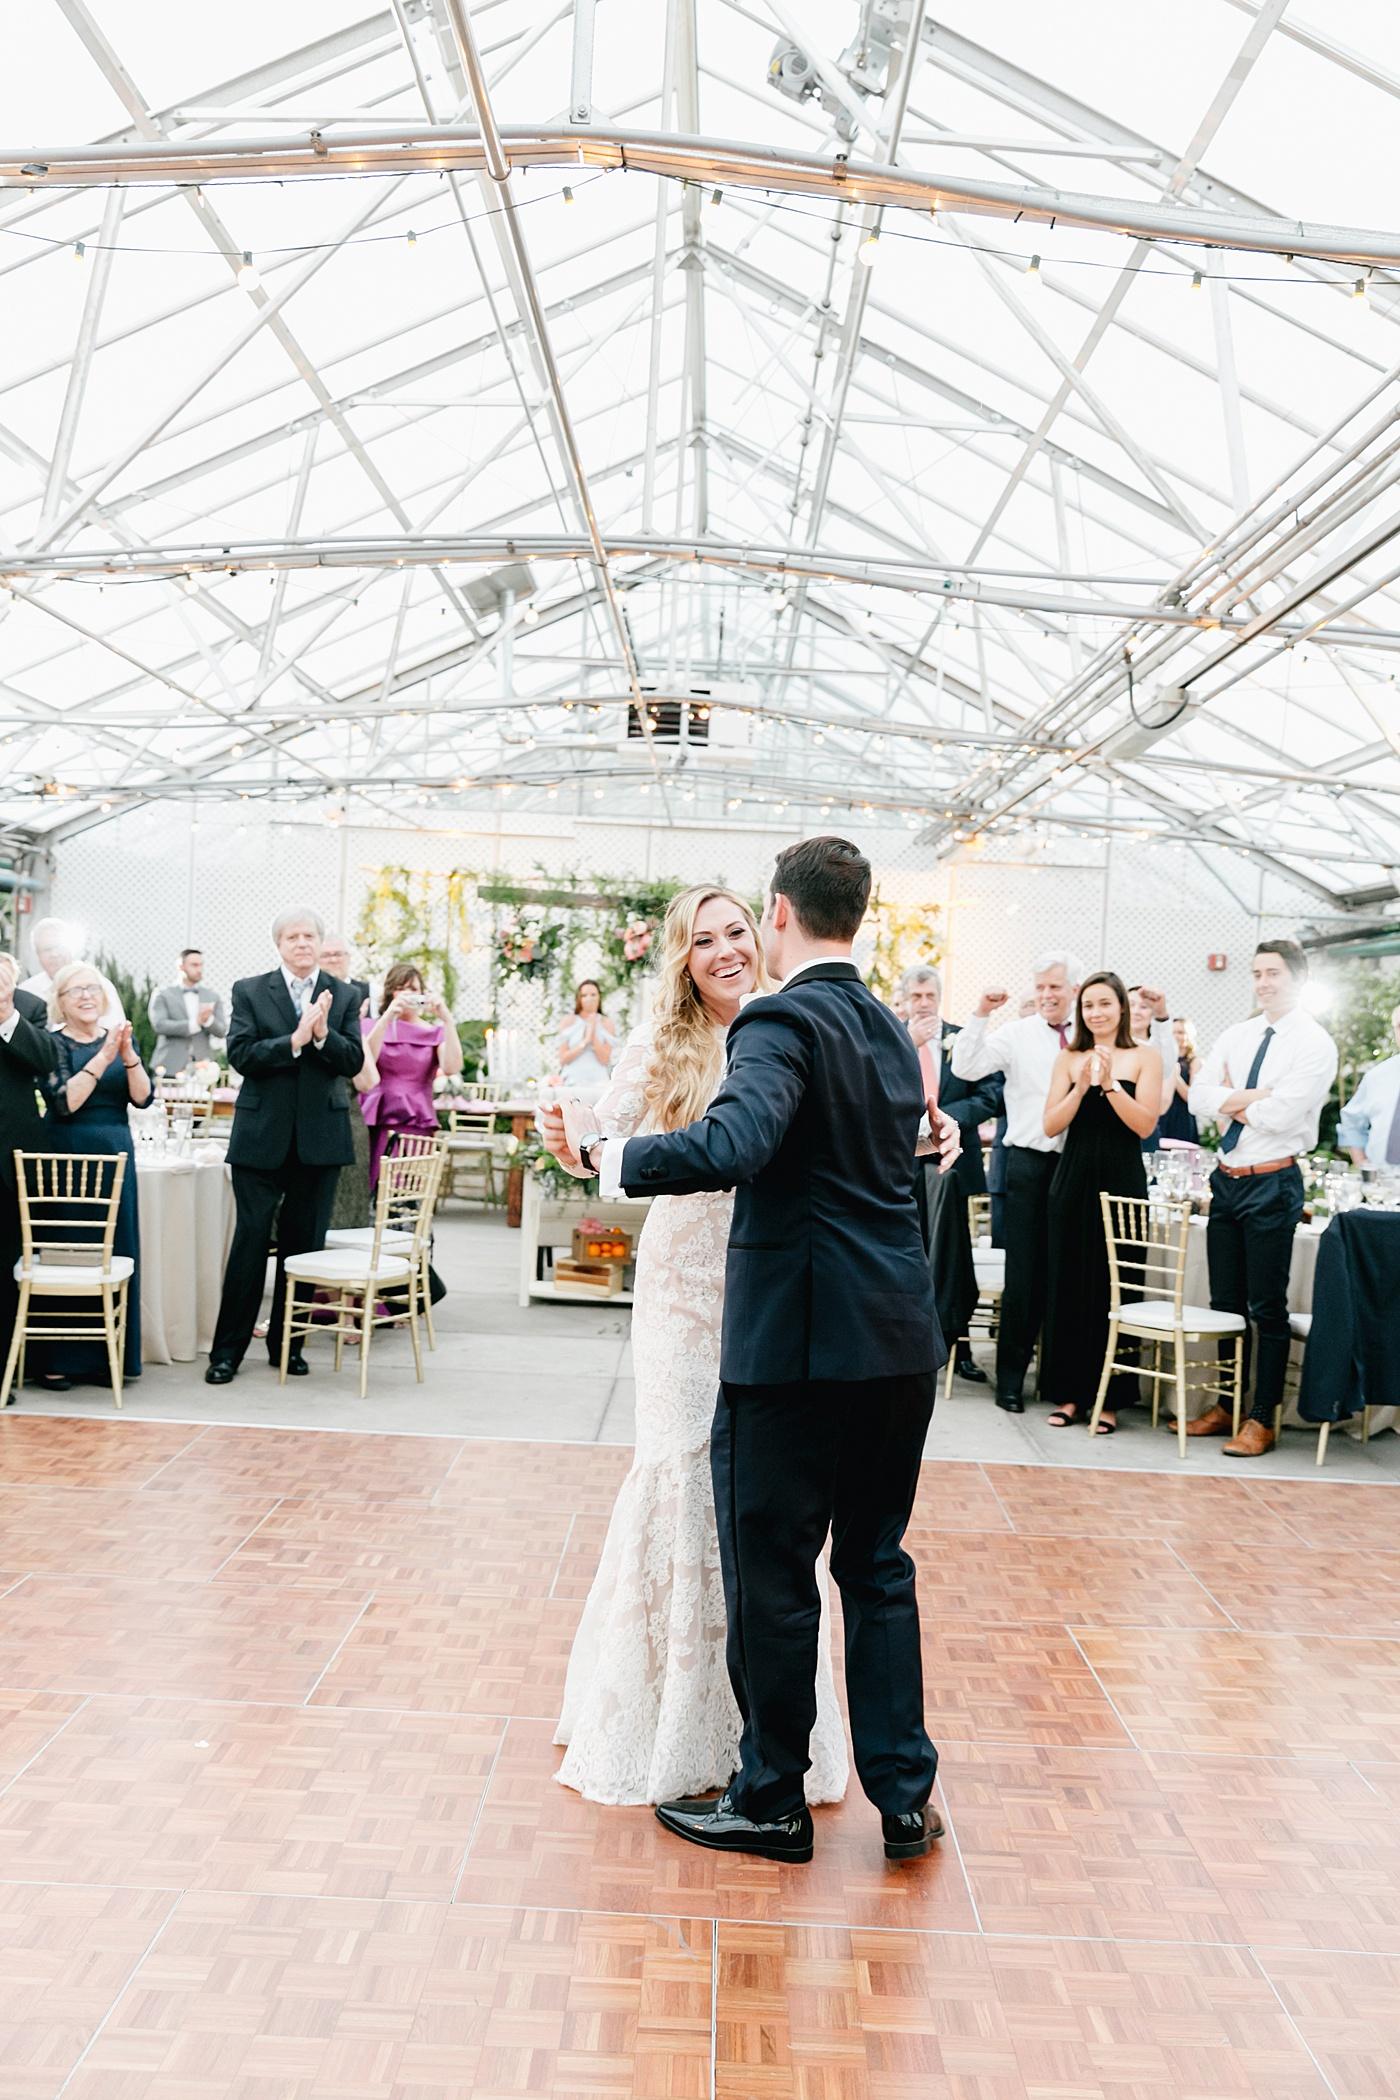 Horticulture Center Wedding, Philadelphia, Blush Watercolor, Rustic Chic